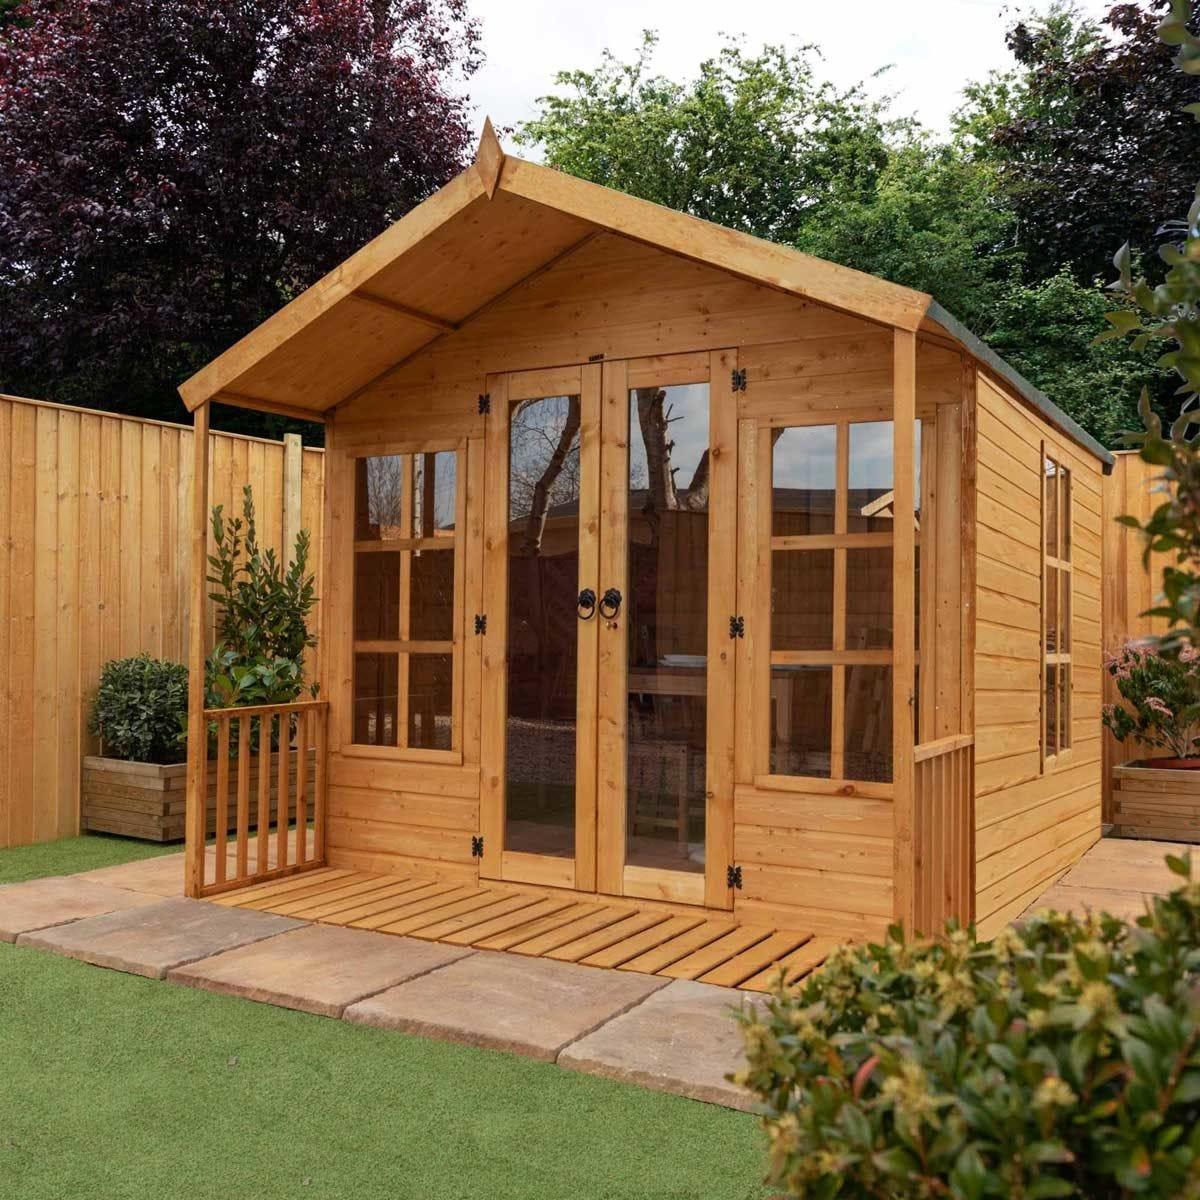 Mercia Traditional Summerhouse - 8 x 8ft